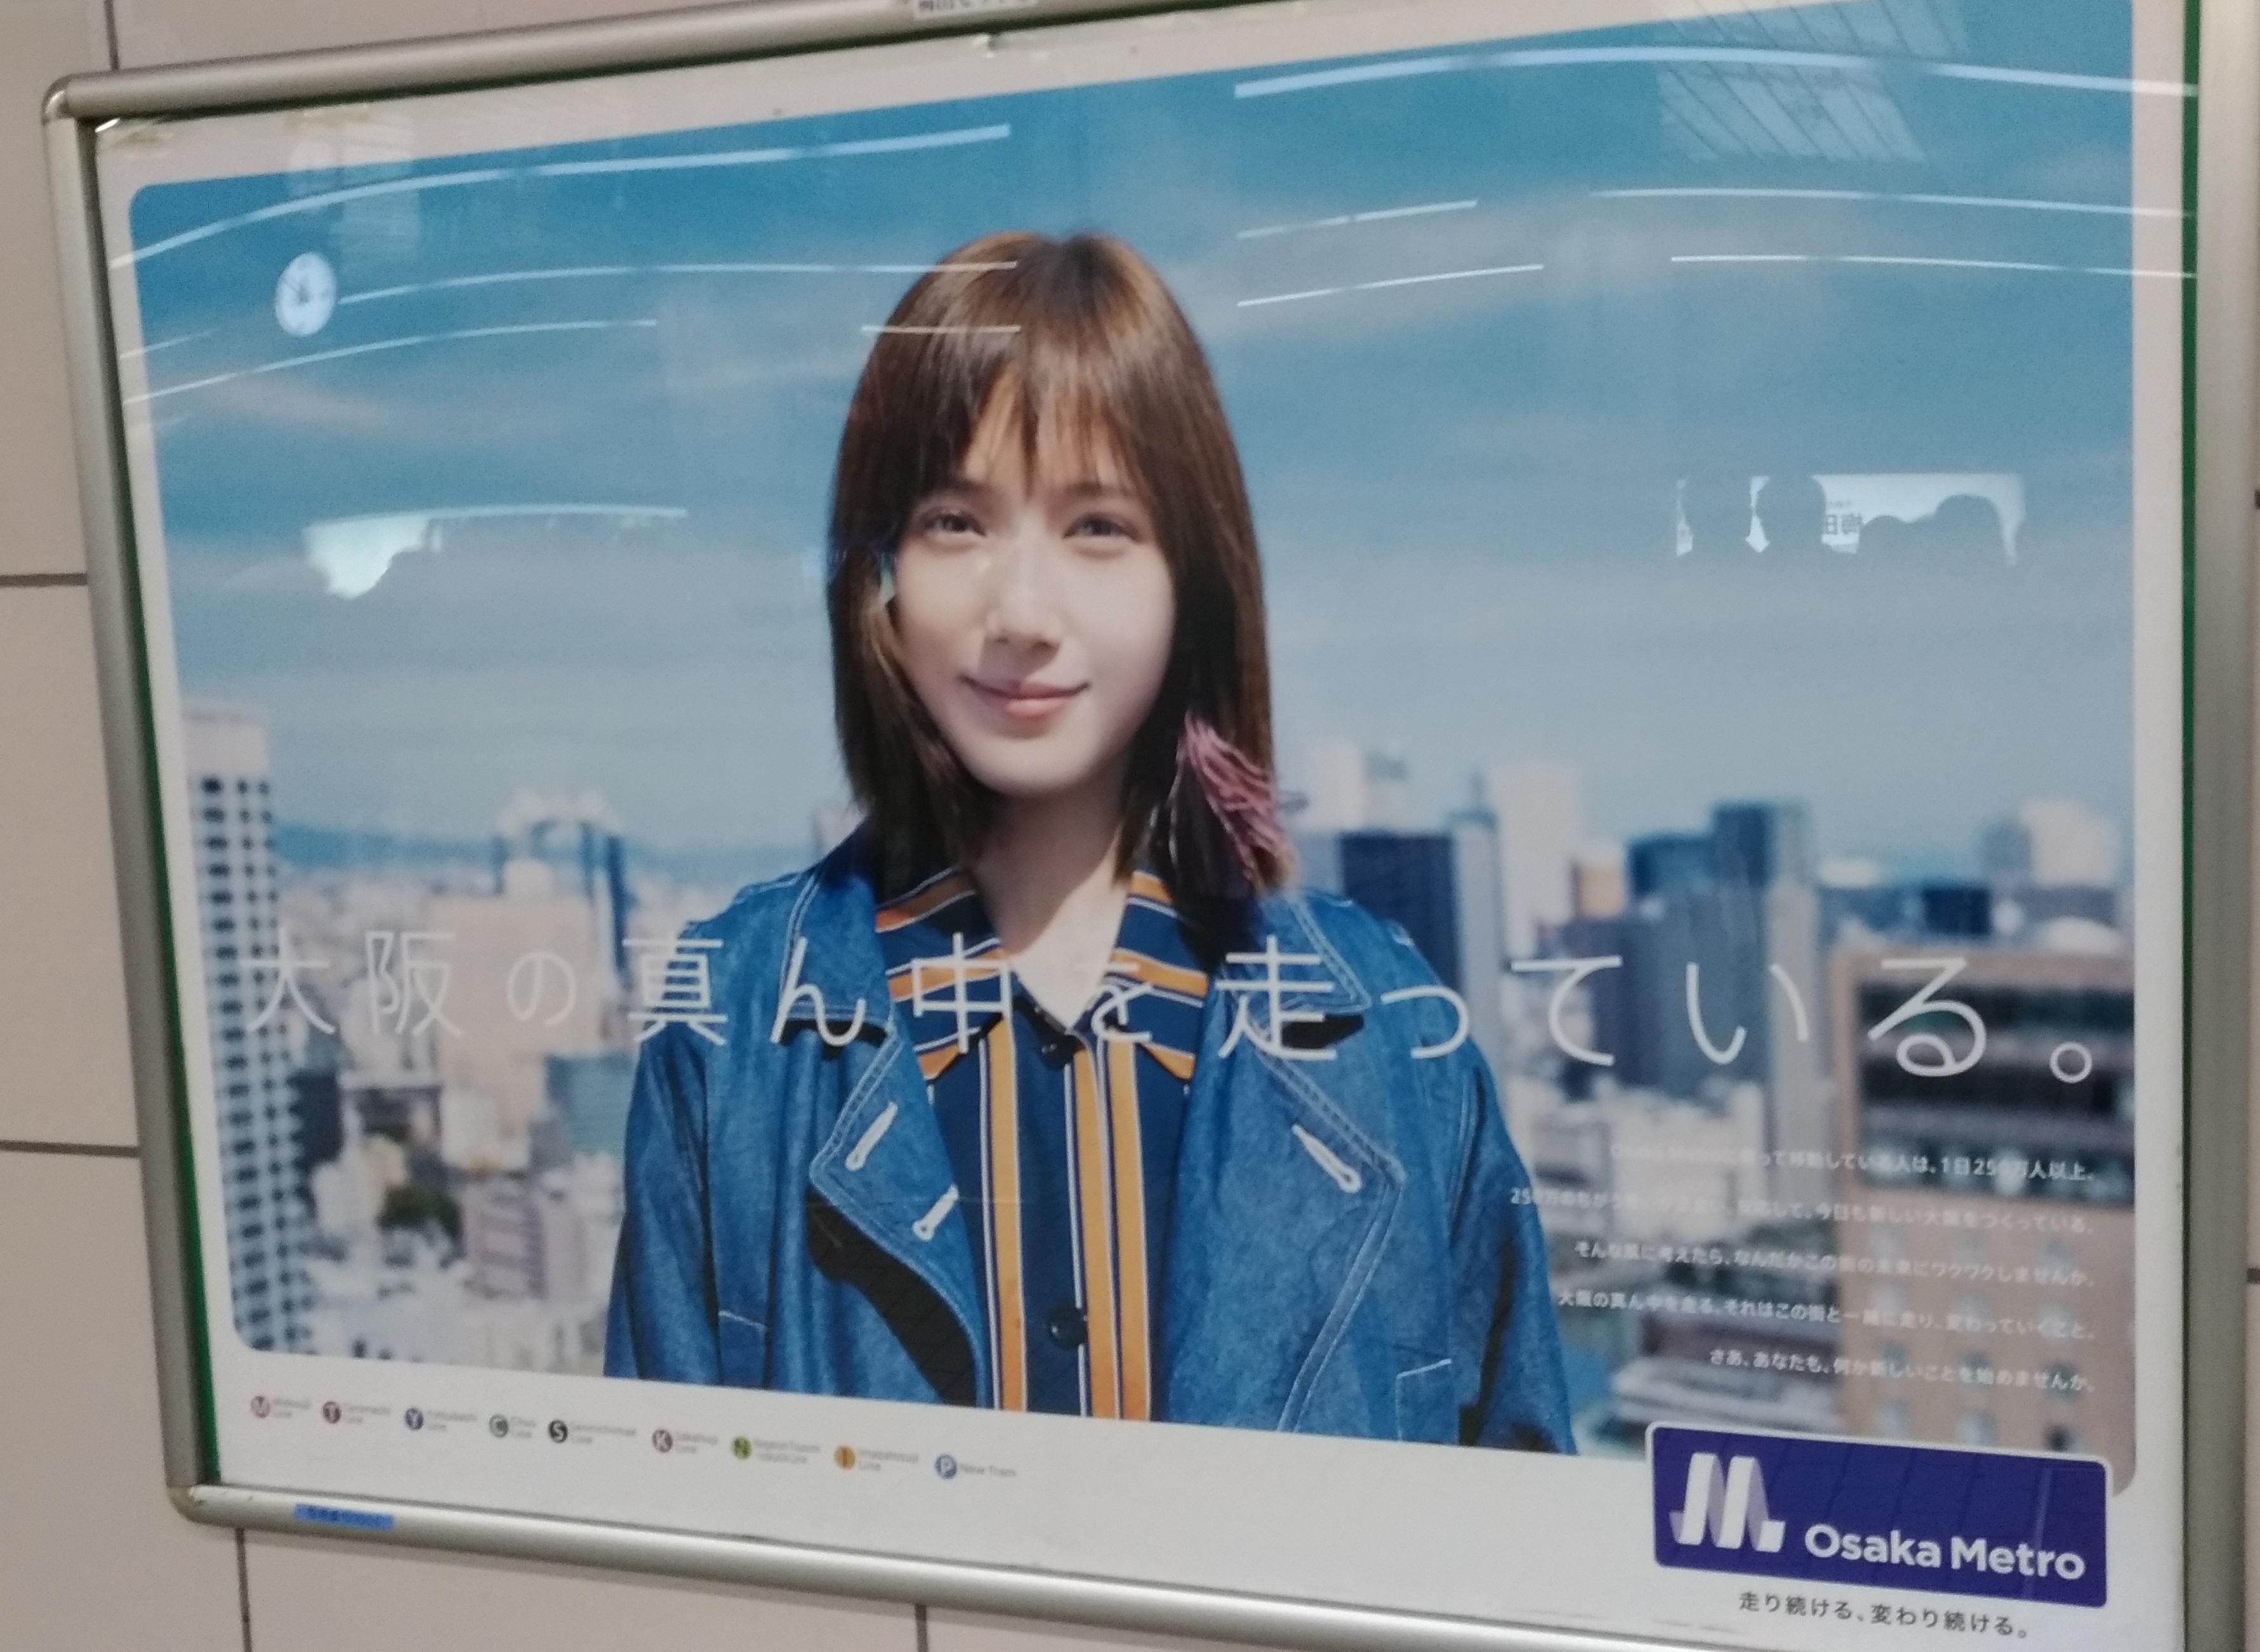 osaka_metro_honda_tsubasa.jpg